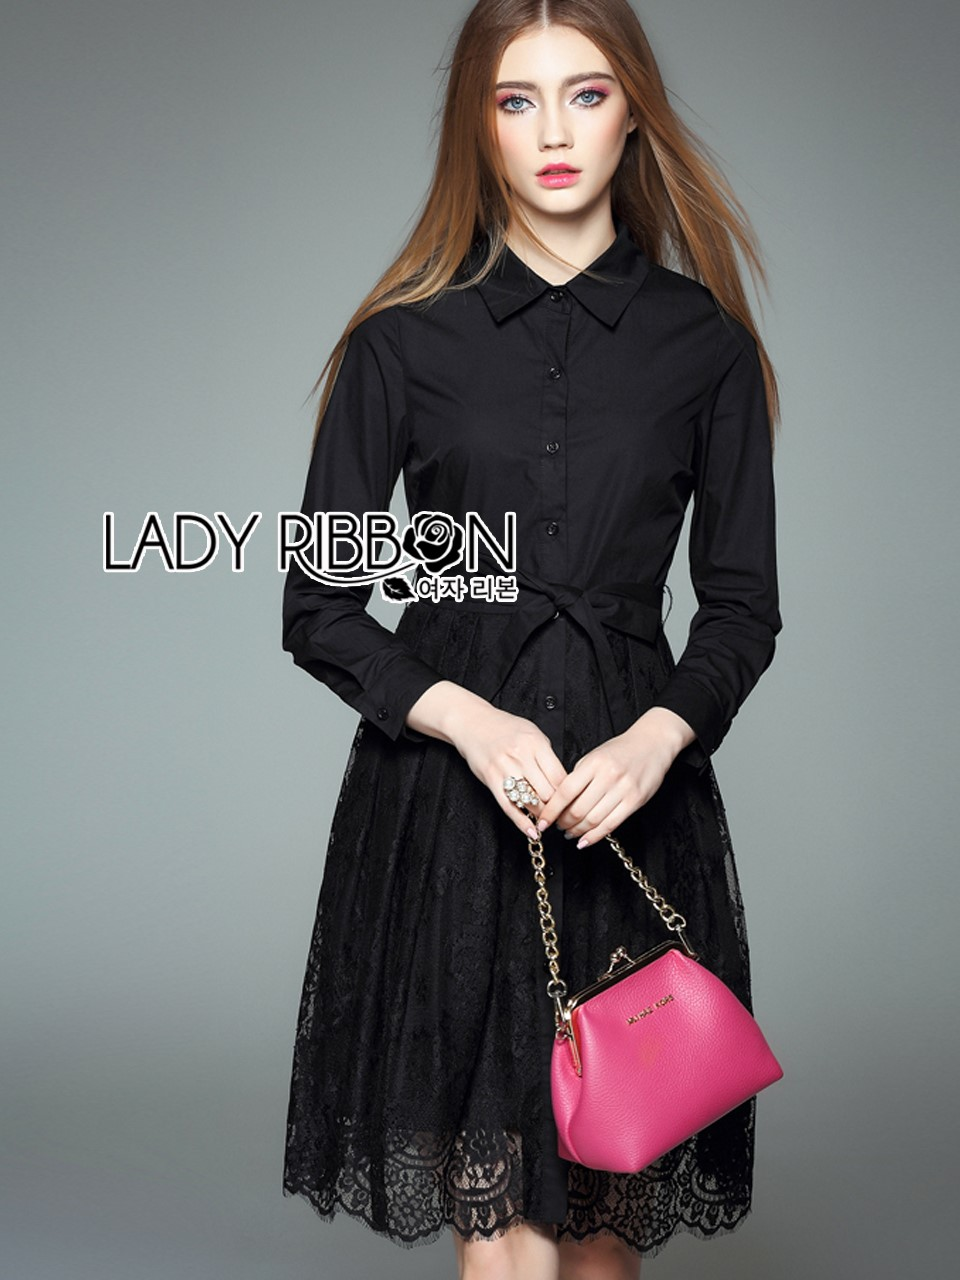 &#x1F380 Lady Ribbon's Made &#x1F380 Lady Kelly Minimal Feminine Poplin Cotton and Lace Shirt Dress